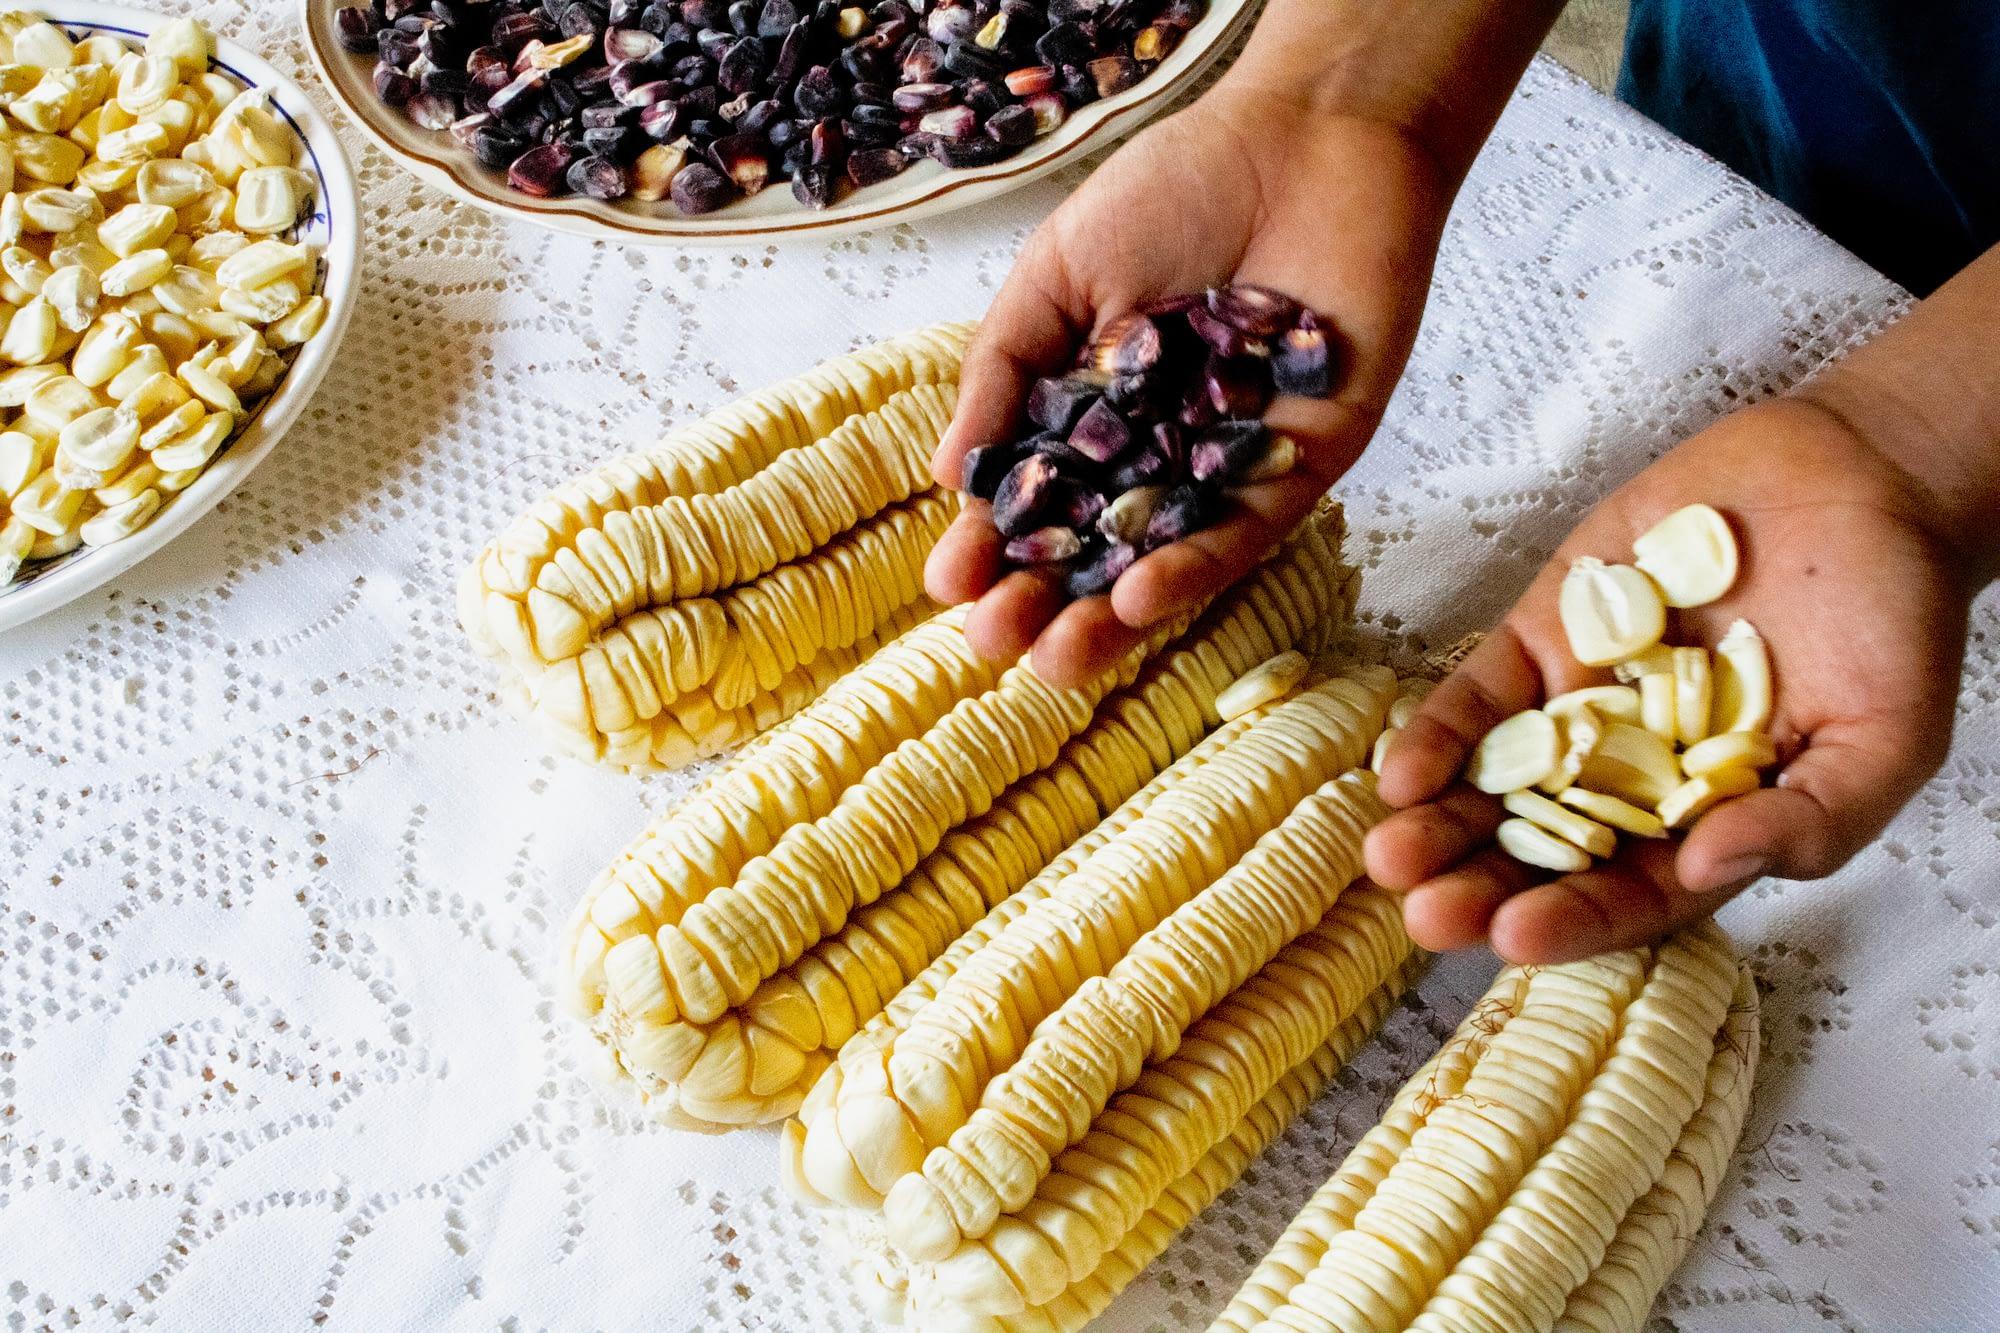 Juarez and Oliveros's grandson shows the family's heirloom maize: maíz colorado (left) and Ancho maize. (Photo: E. Orchardson/CIMMYT)